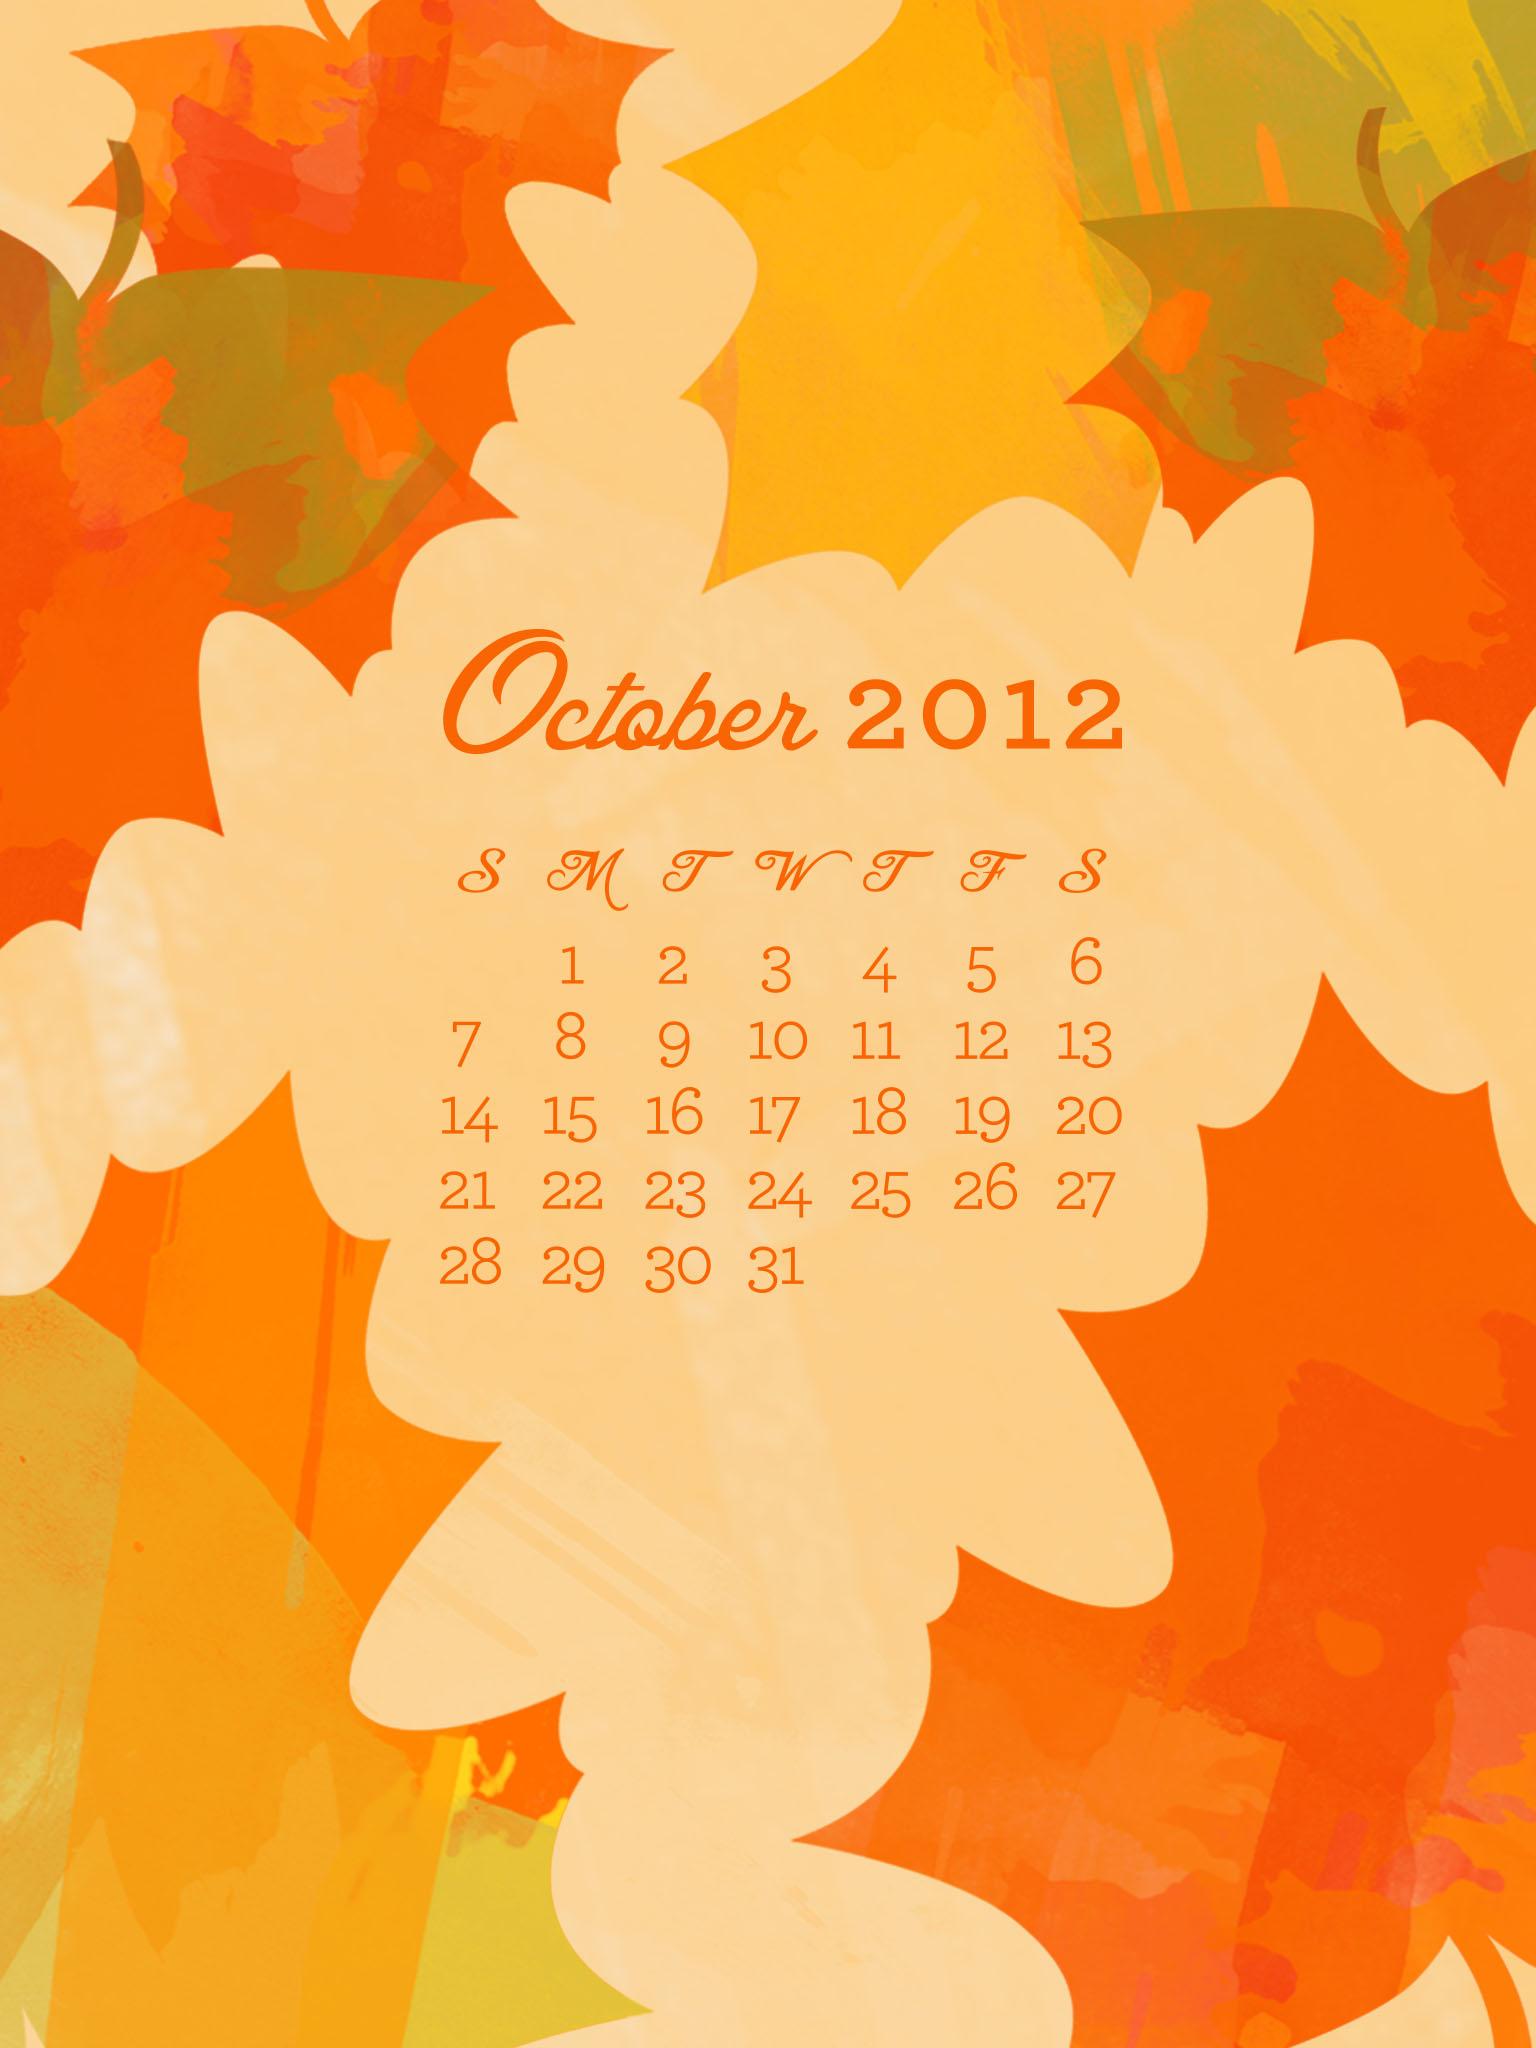 October Calendar Wallpaper Iphone : Sarah hearts october desktop iphone ipad